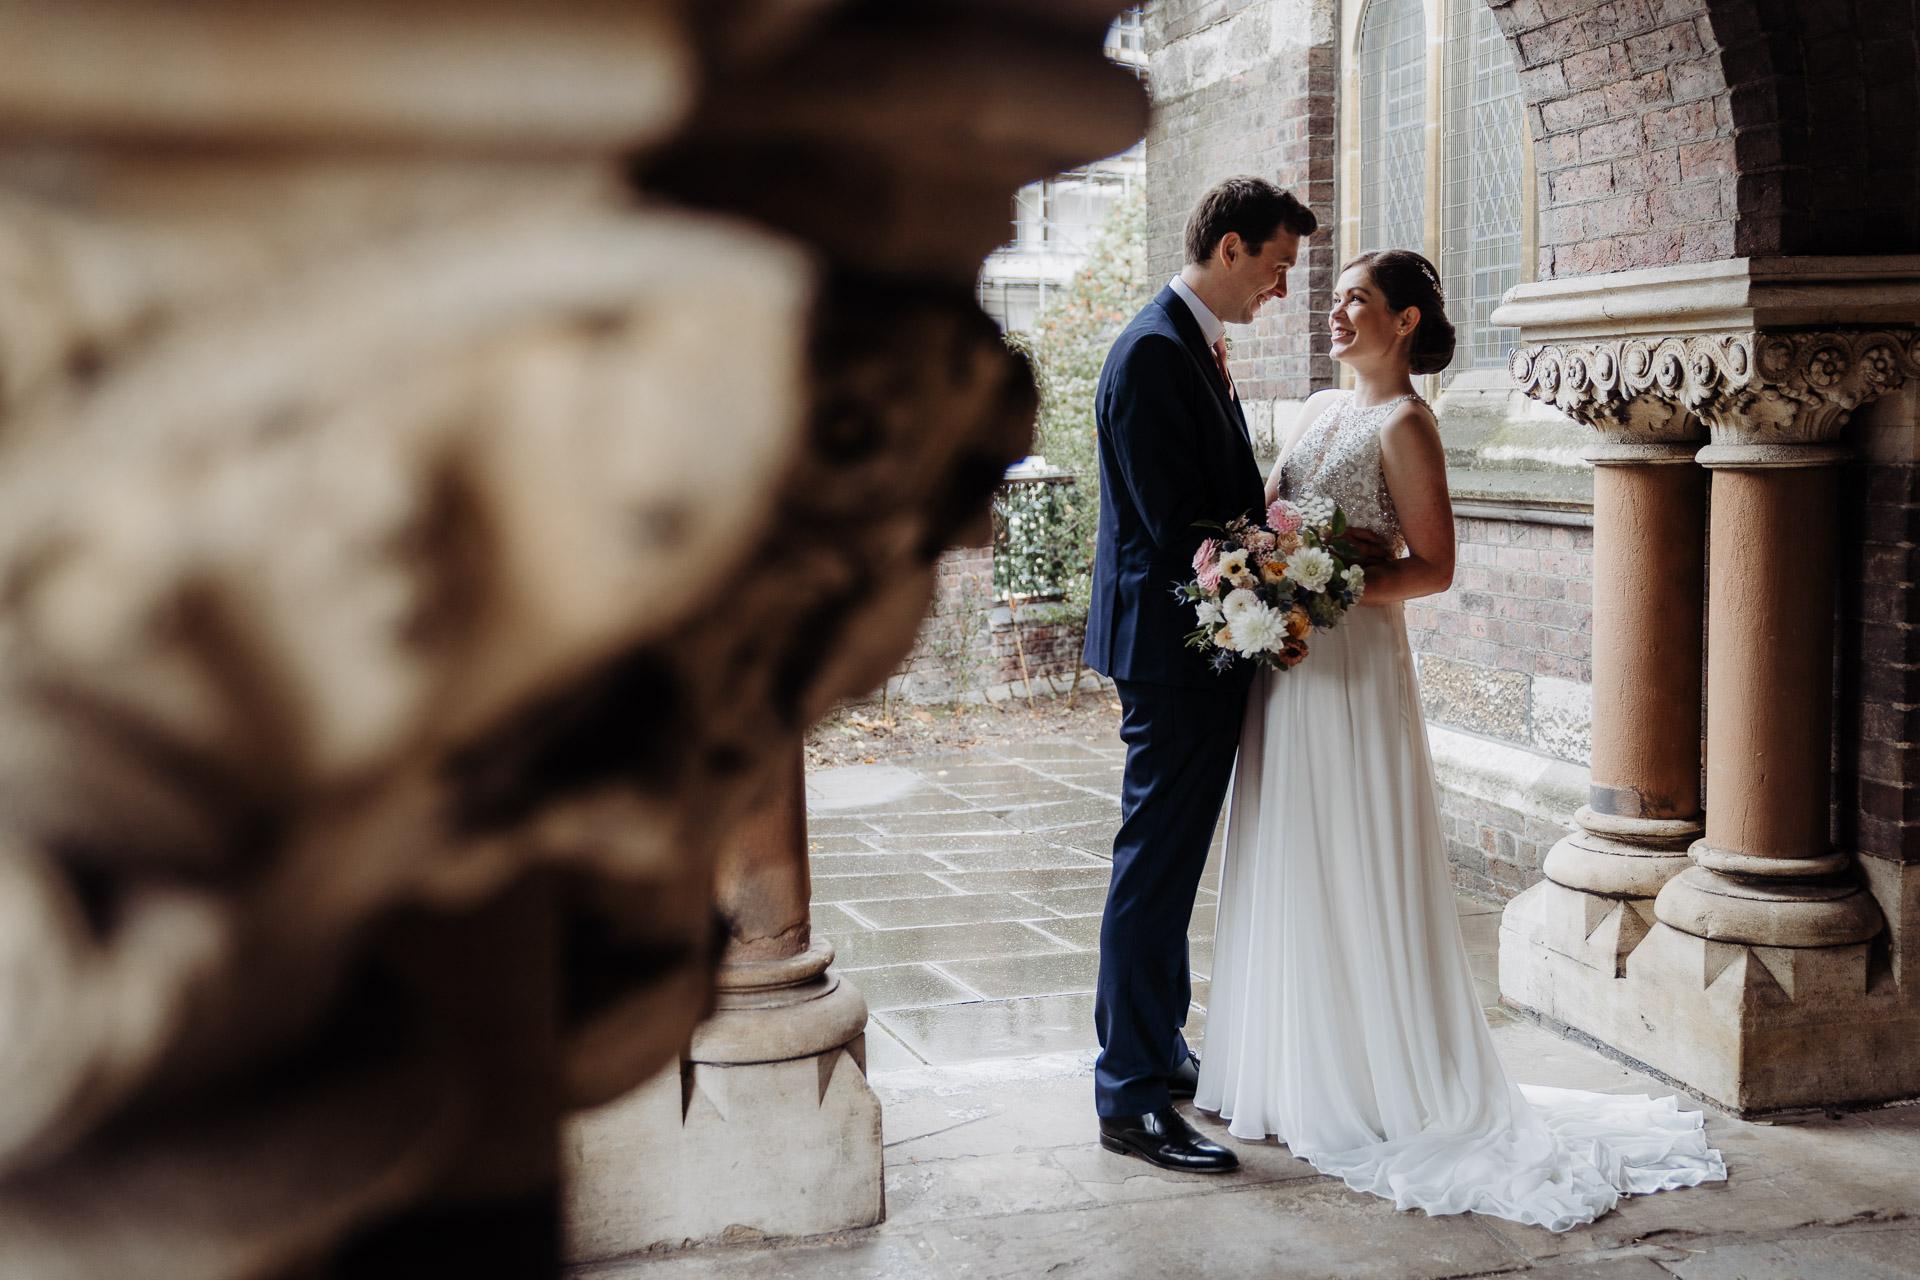 st-stephens-hampstead-wedding-photographer-025